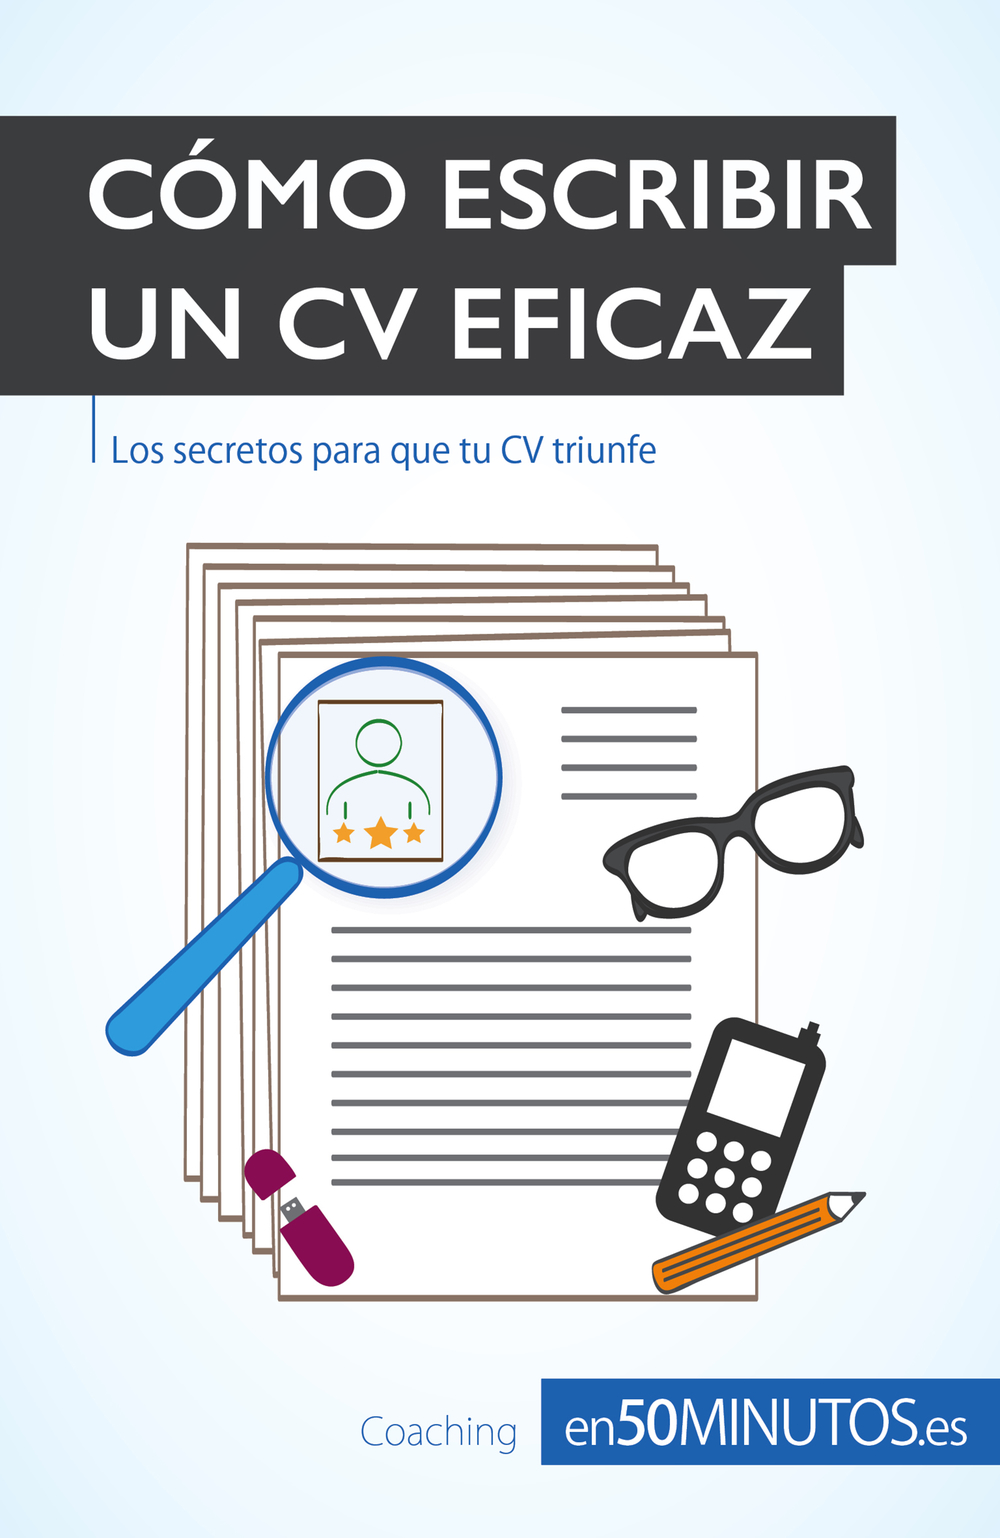 Cómo escribir un CV eficaz